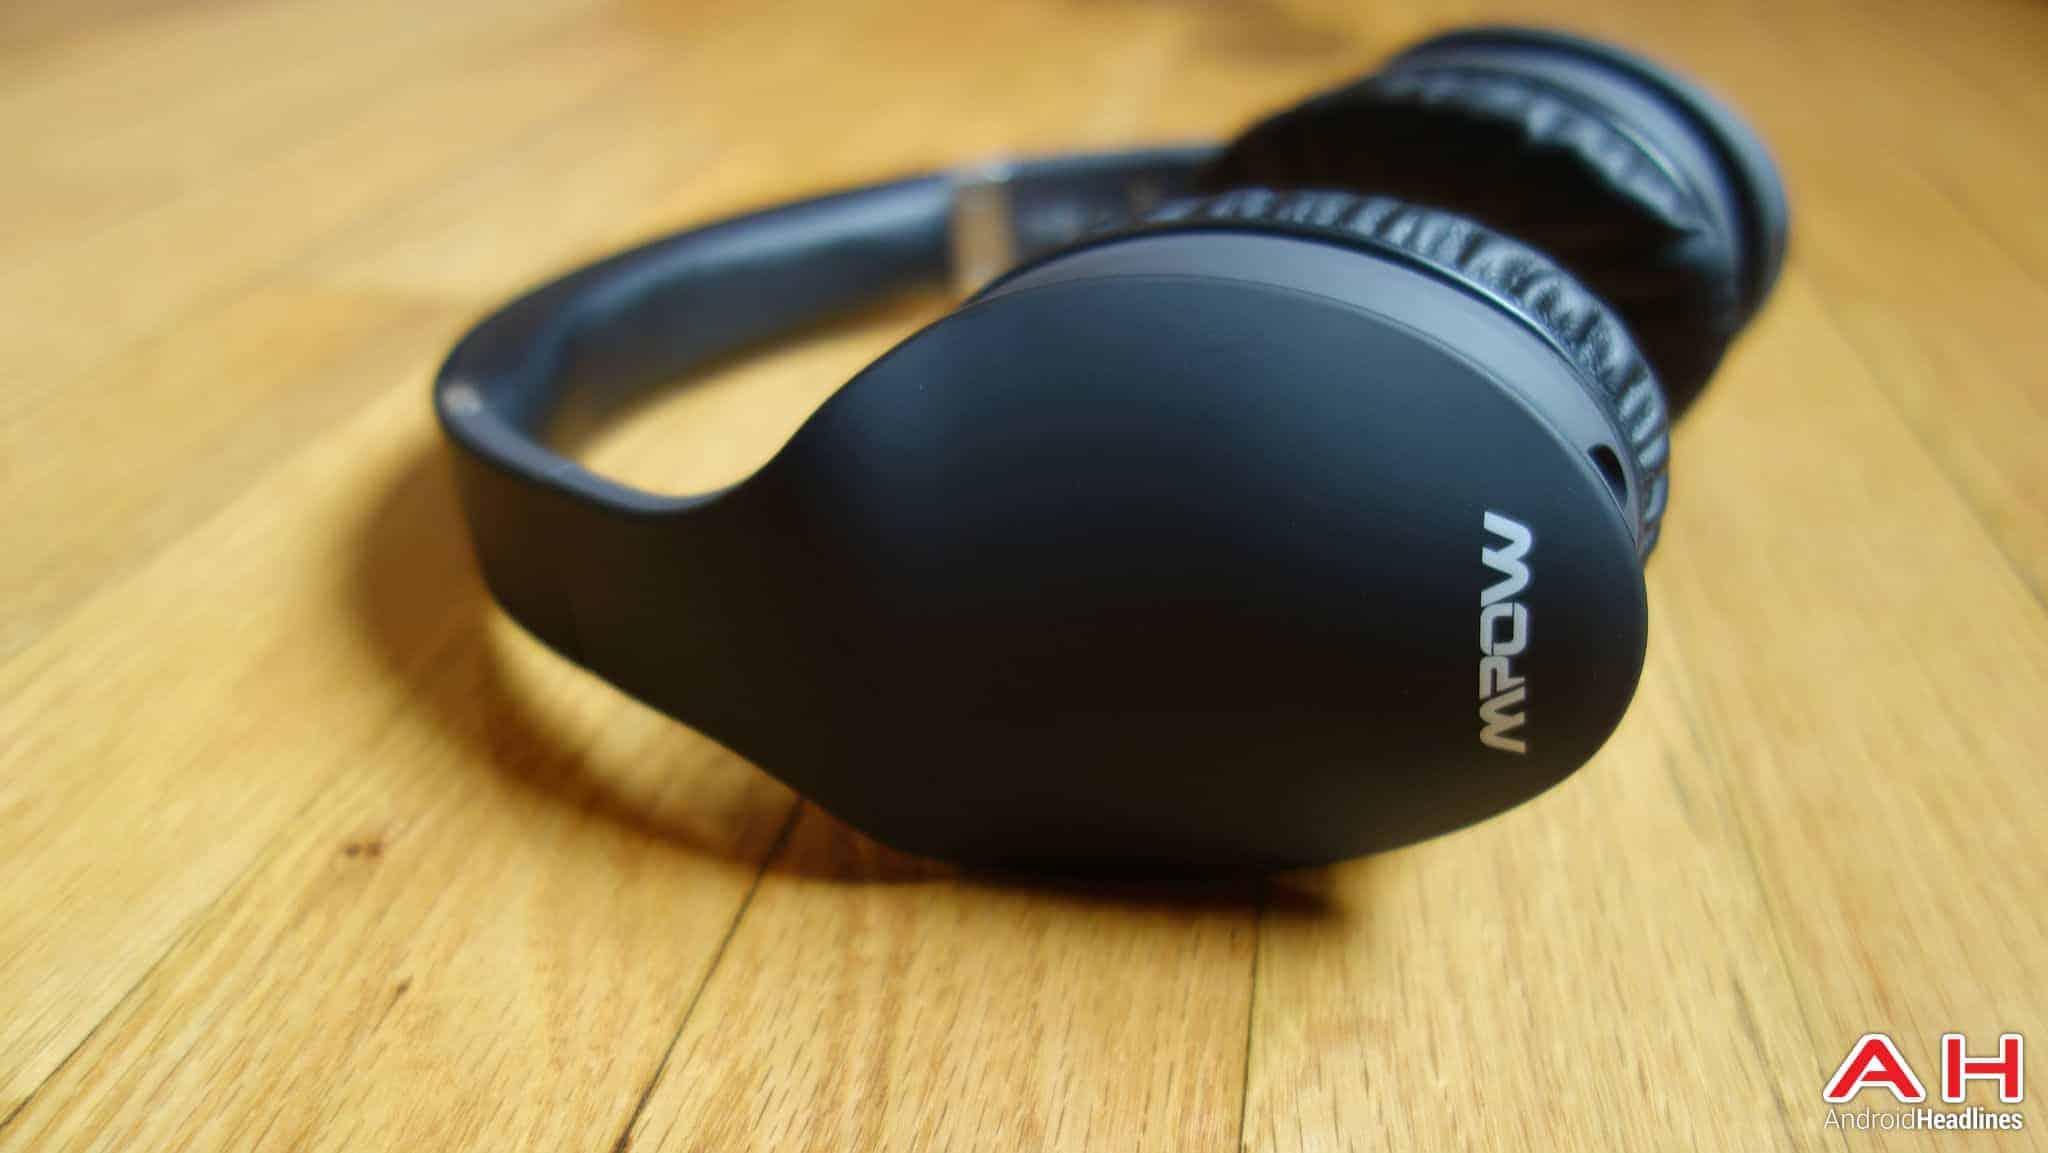 mpow muze touch bluetooth headphones 1